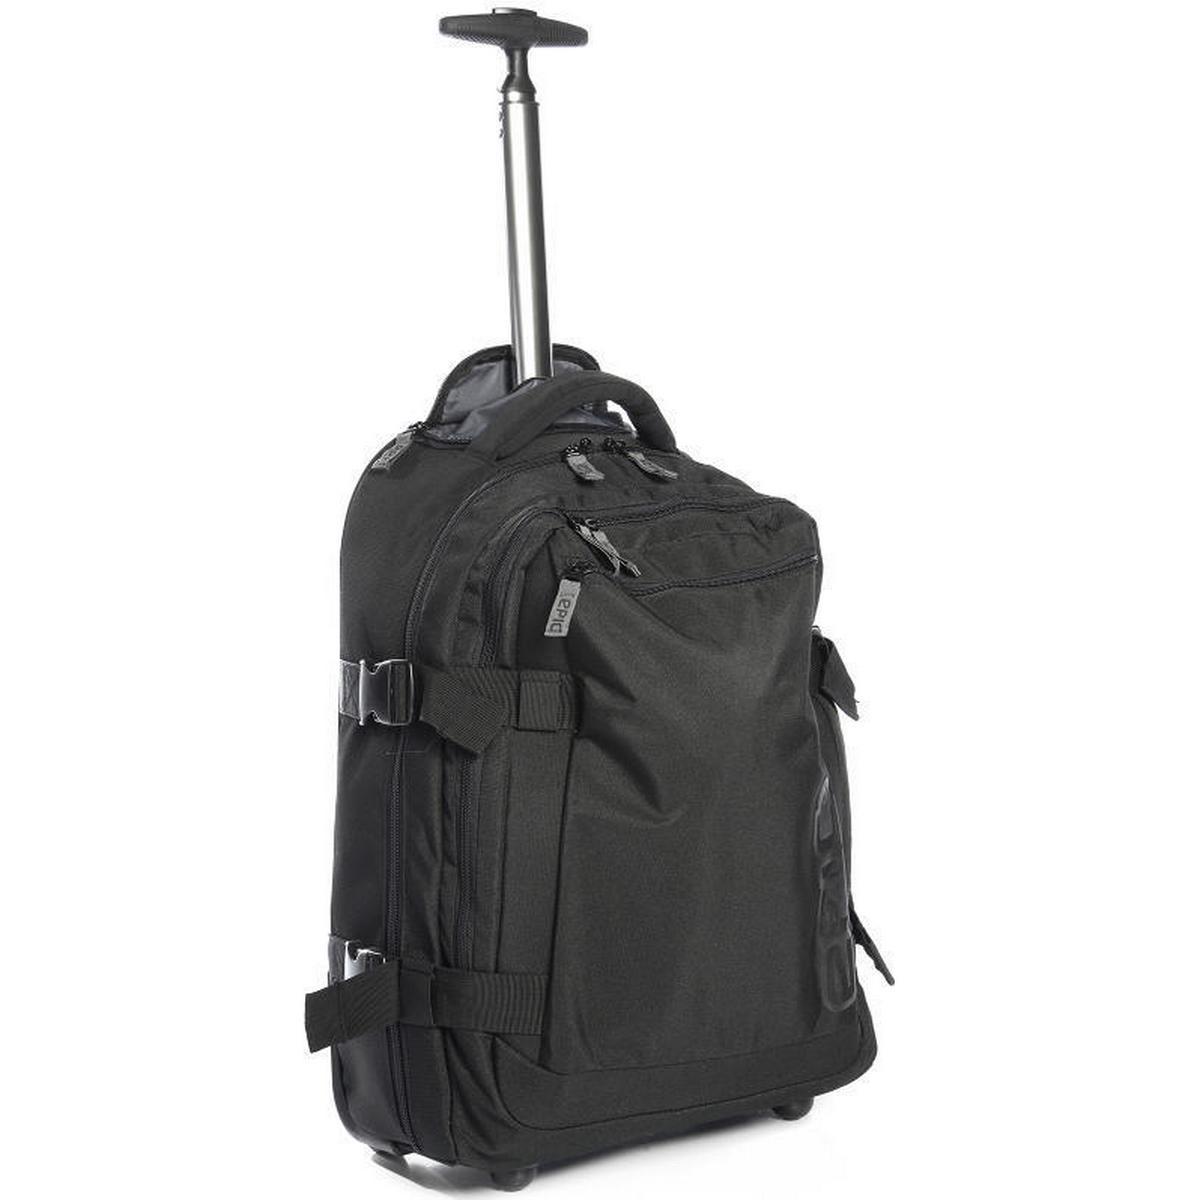 Epic ryggsäck • Hitta det lägsta priset hos PriceRunner nu »